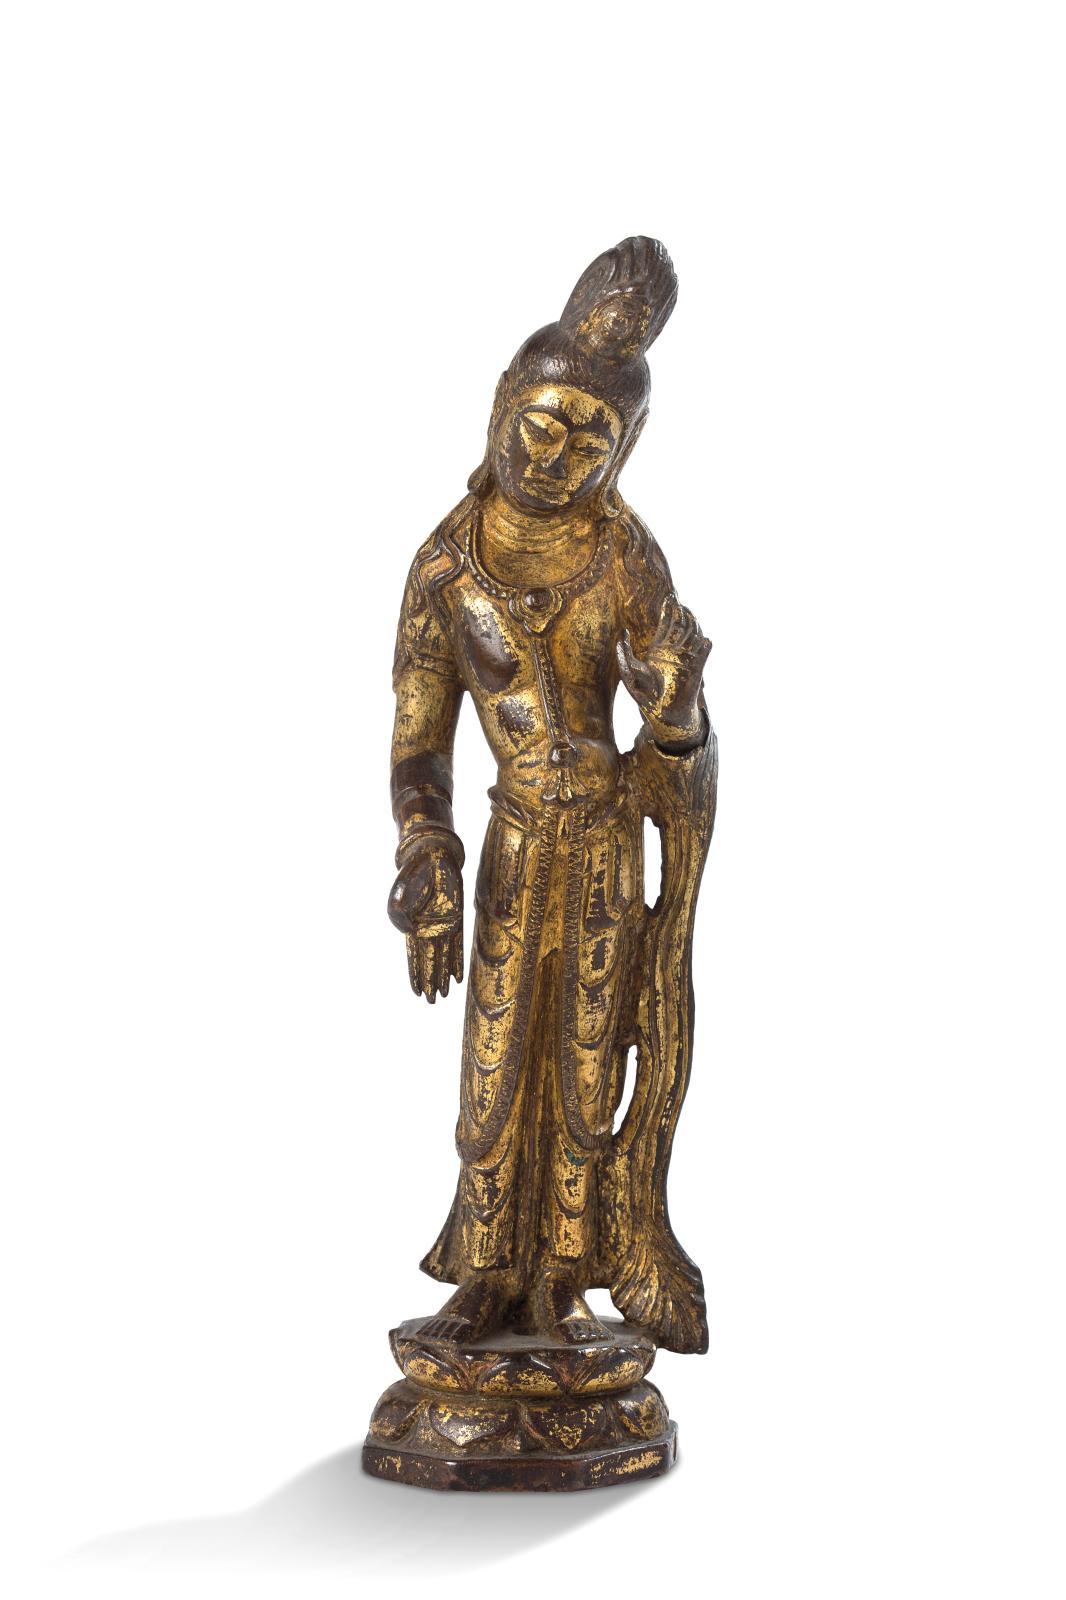 Chine, période Tang (618-907), statuette en bronze laqué or, représentant Avalokiteshvara debout sur un lotus en abhaya-varada mudra, avec